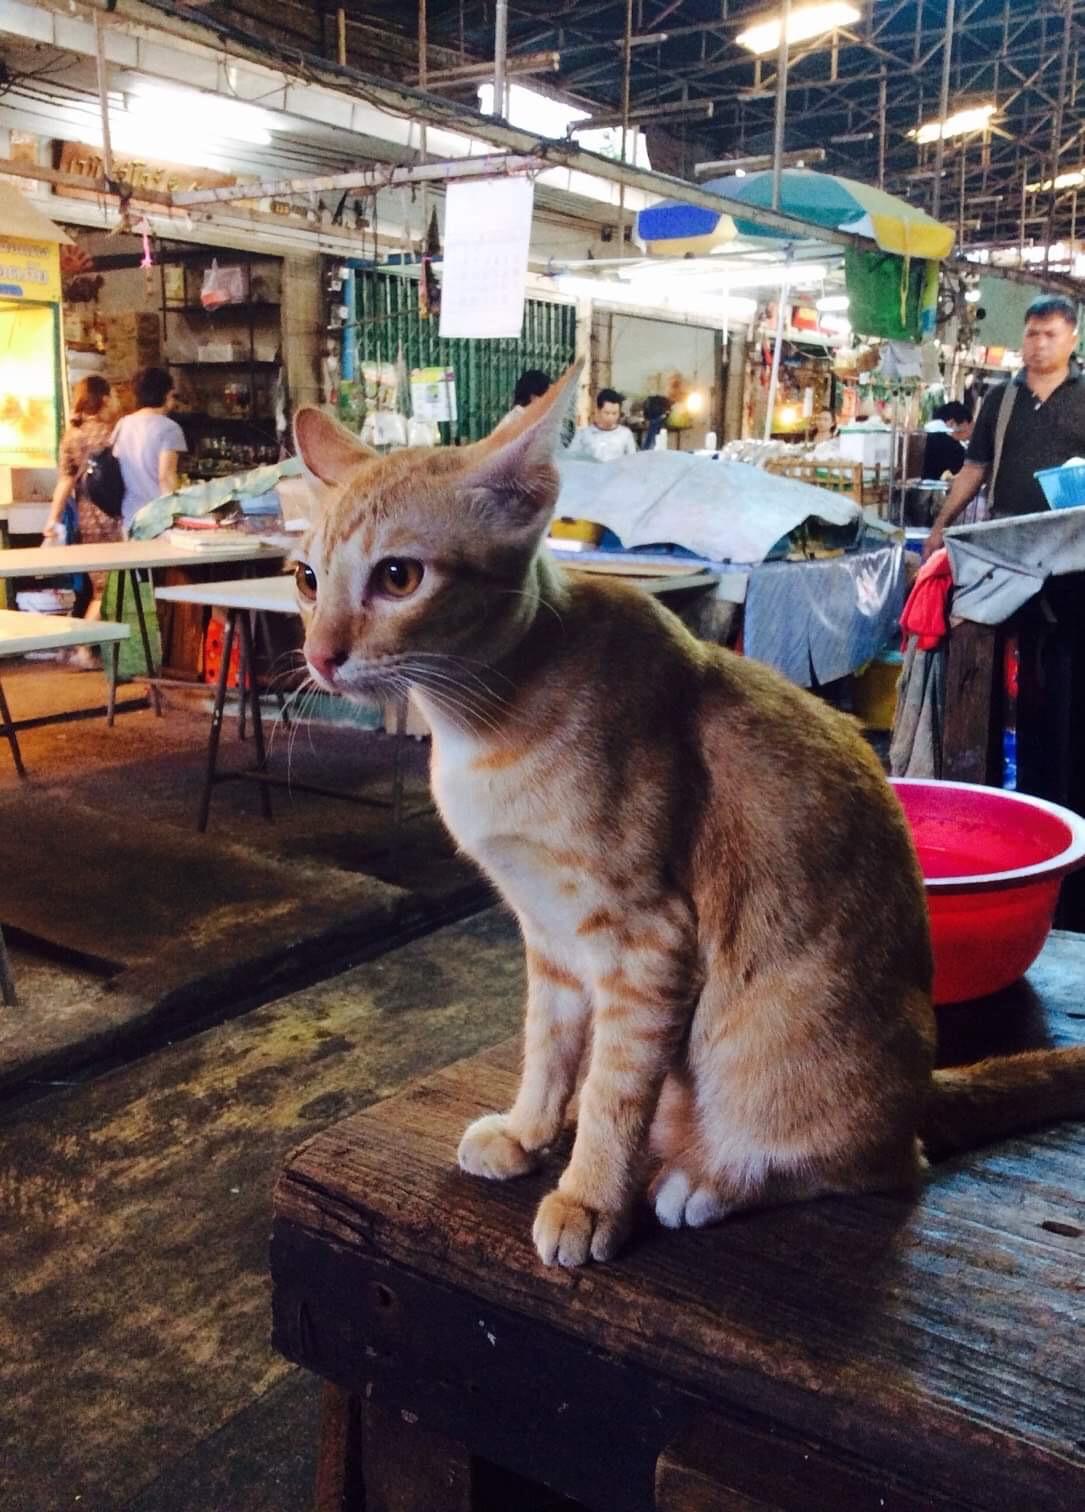 LONELY CAT AT THE WET MARKET 🐱🐈😕 ( เจ้าเหมียวเปลี่ยวเหงา ณ ตลาดสด 🐱🐈😕 )